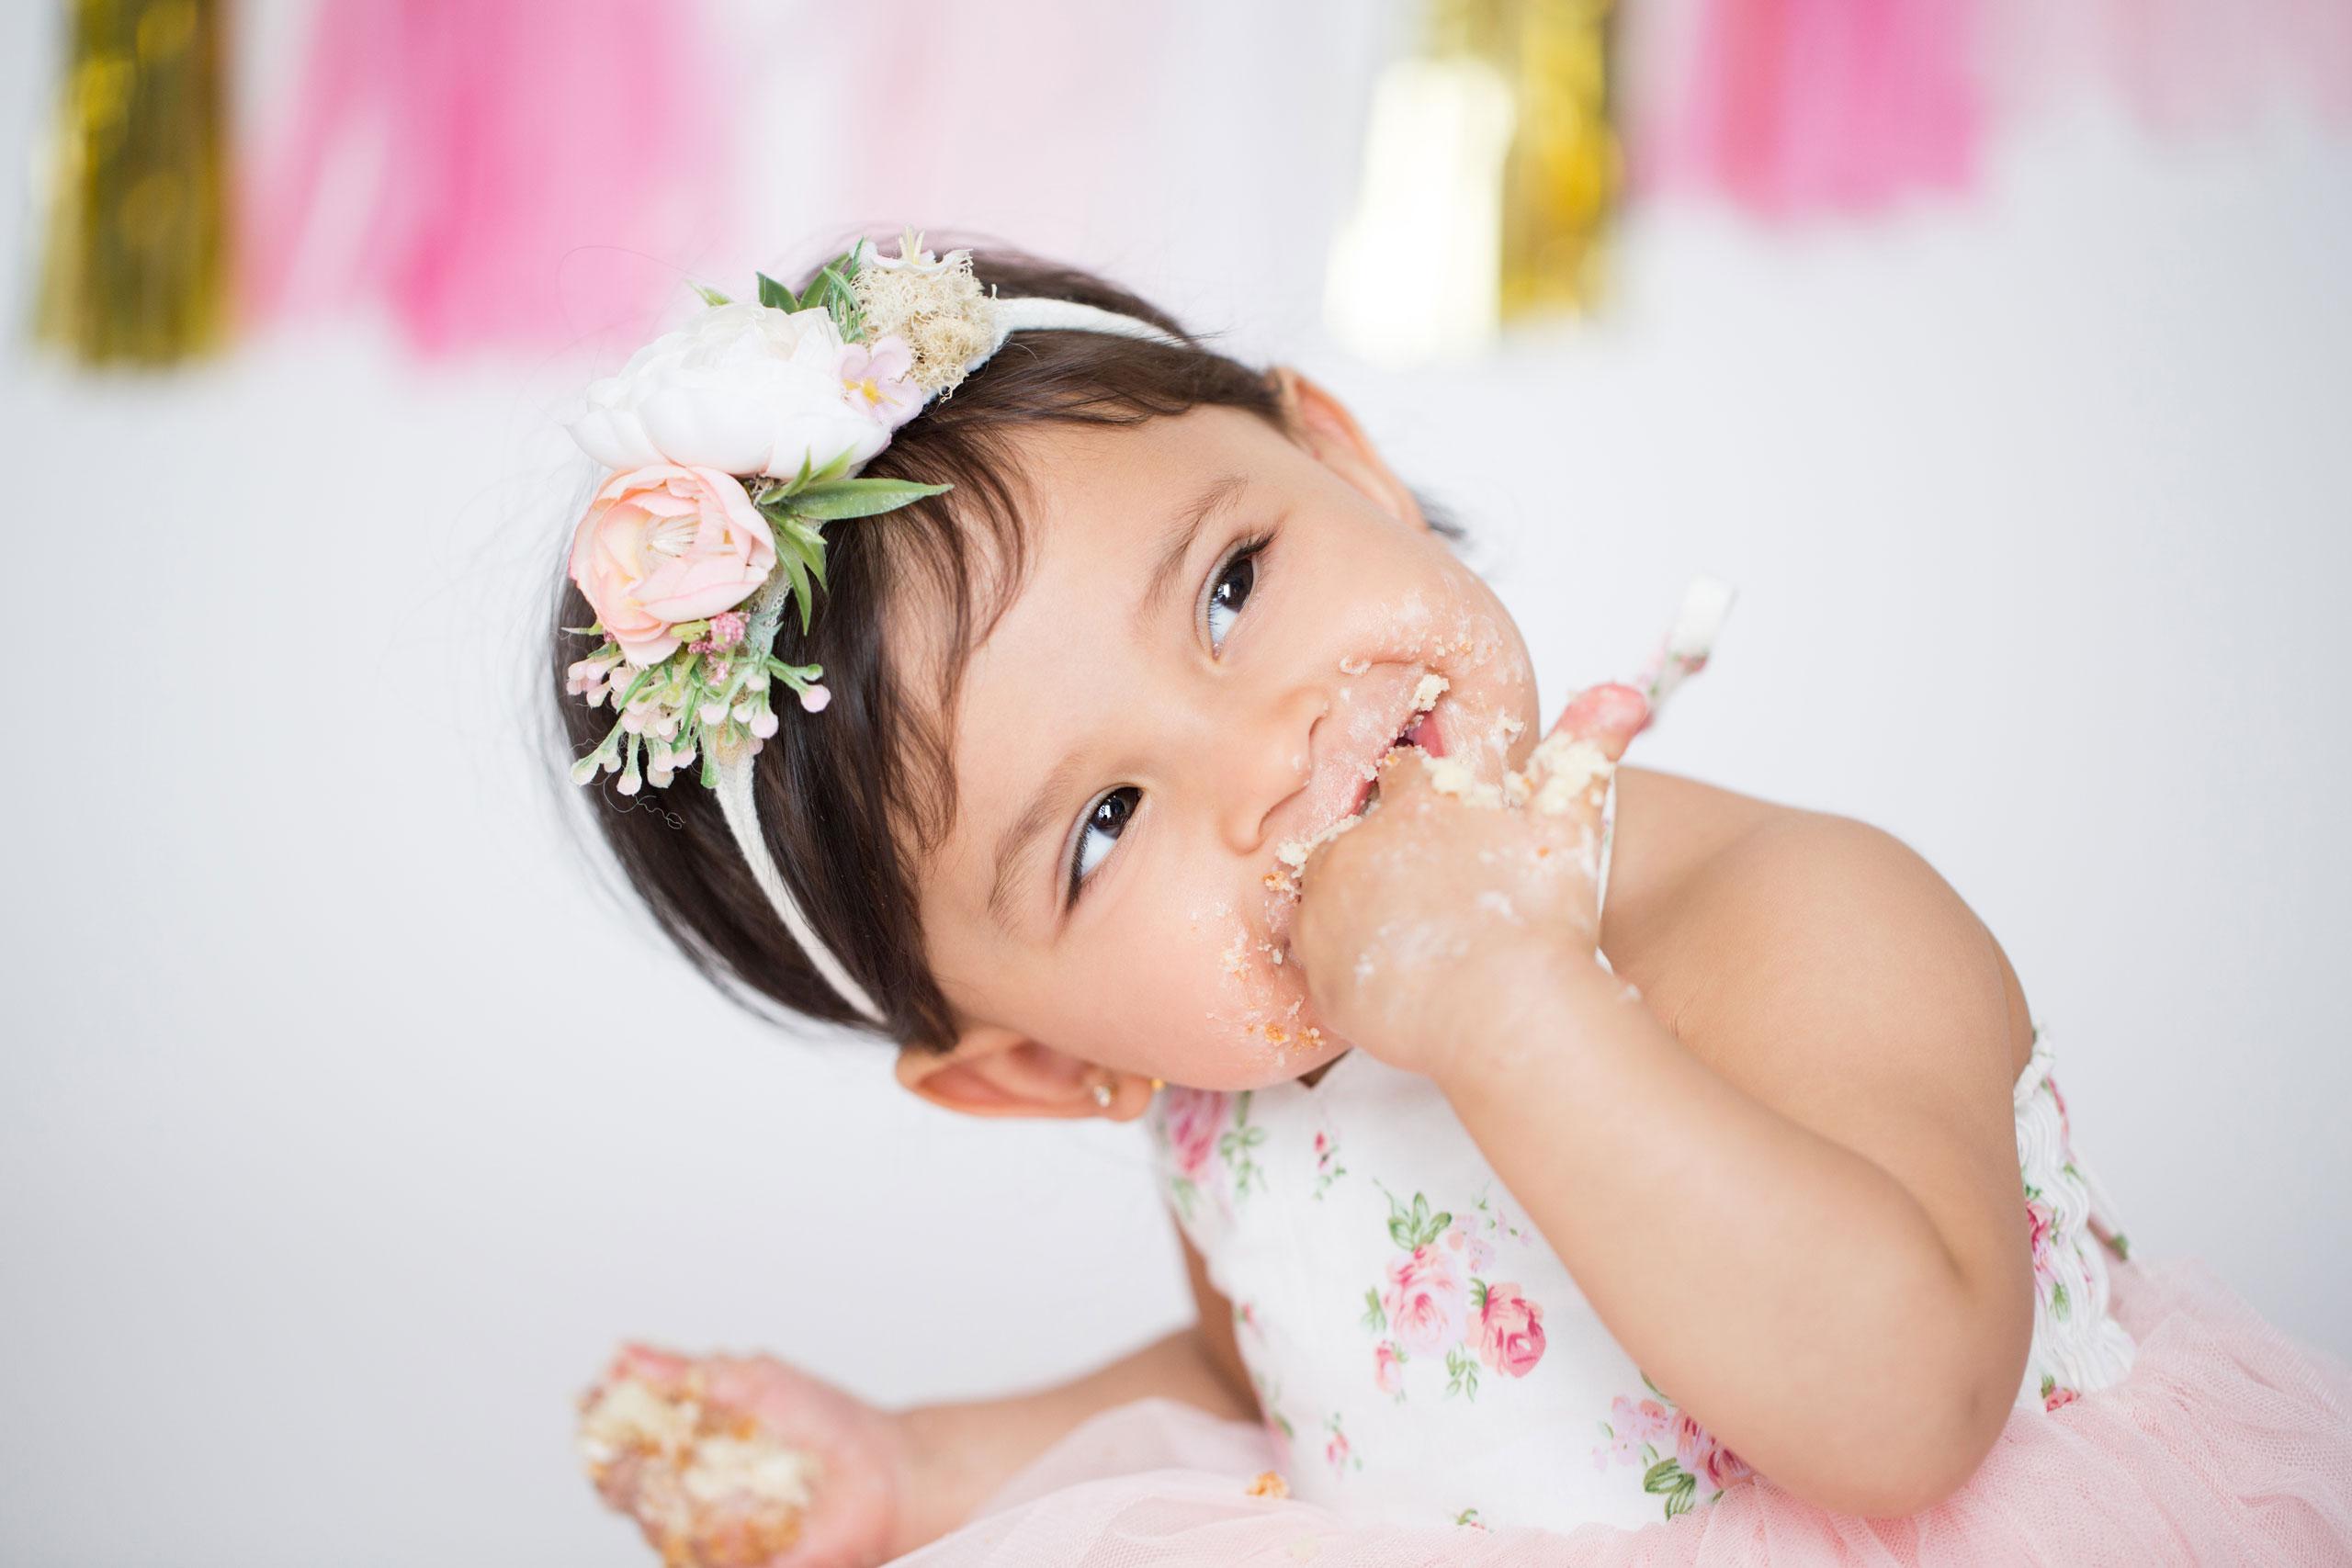 ramina magid baby cake smash photography los angeles